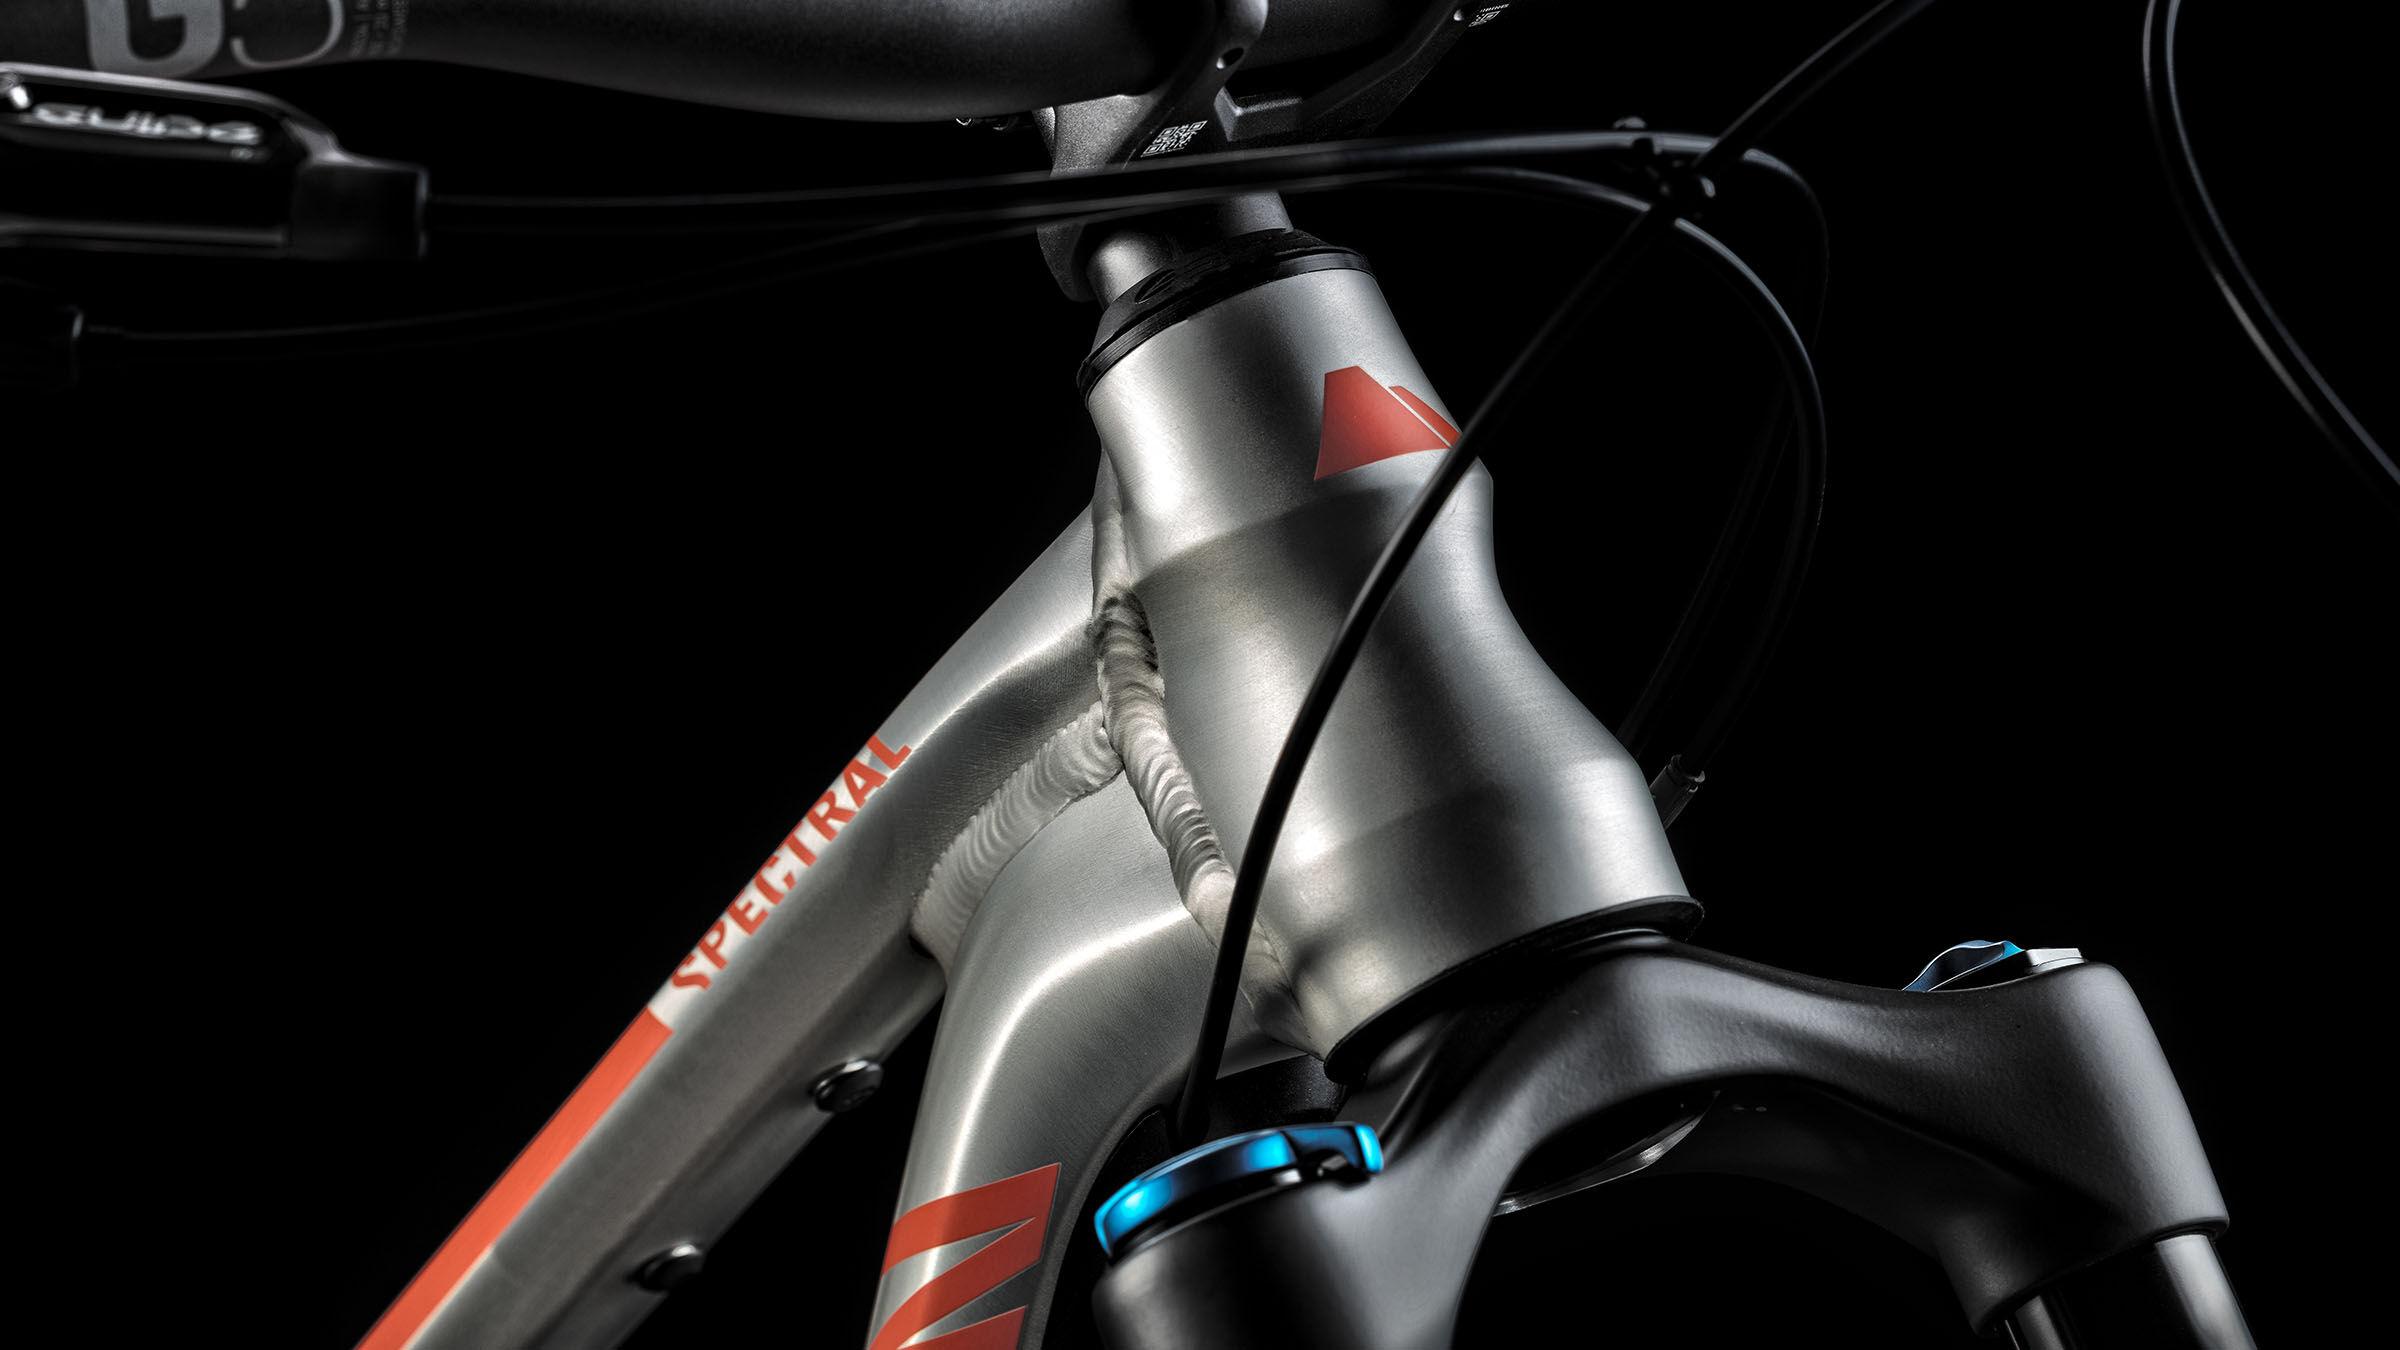 Pick Your Color Canyon Bikes Frame Decal Set USA Seller!